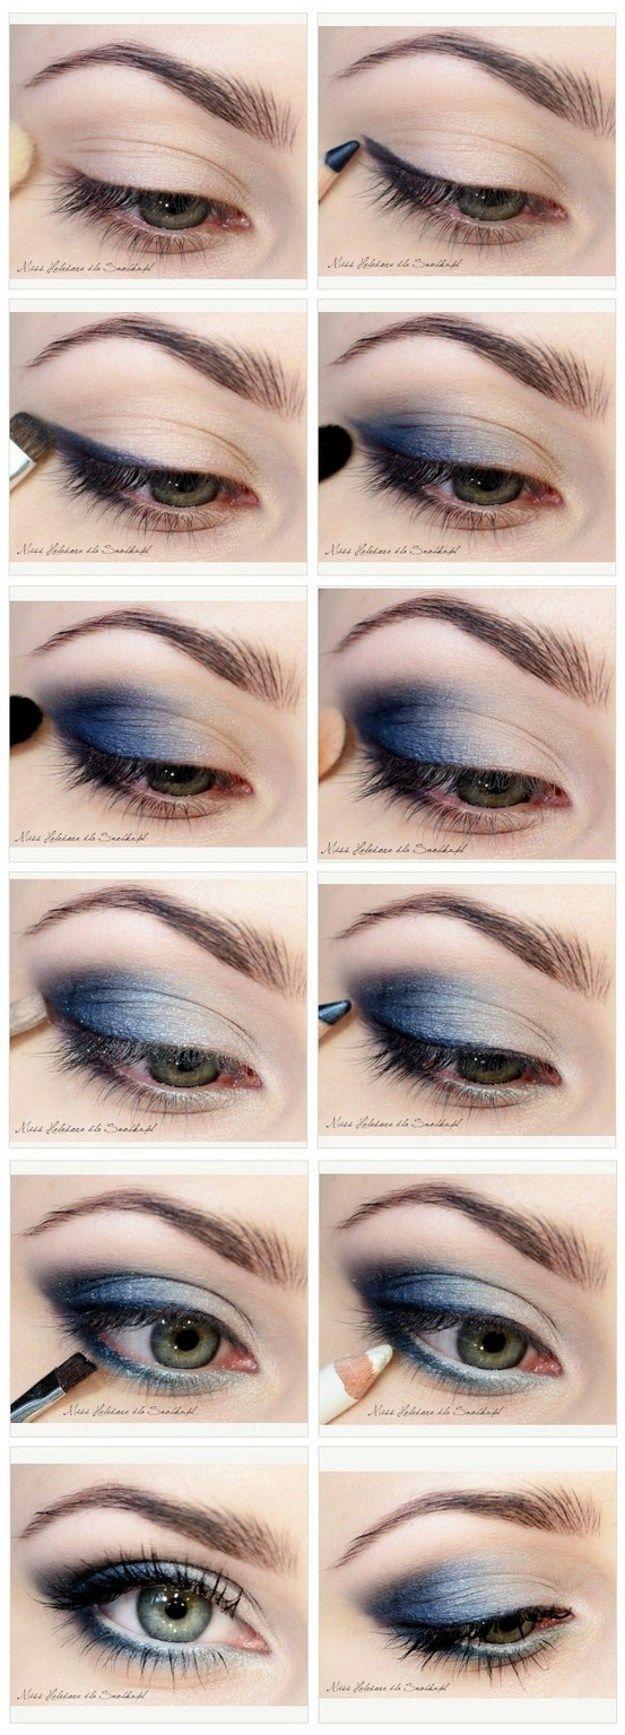 How to Do Blue Smokey Eyes   DIY Makeup  by Makeup Tutorials by http://www.makeuptutorials.com/makeup-tutorials-graduation-beauty-ideas